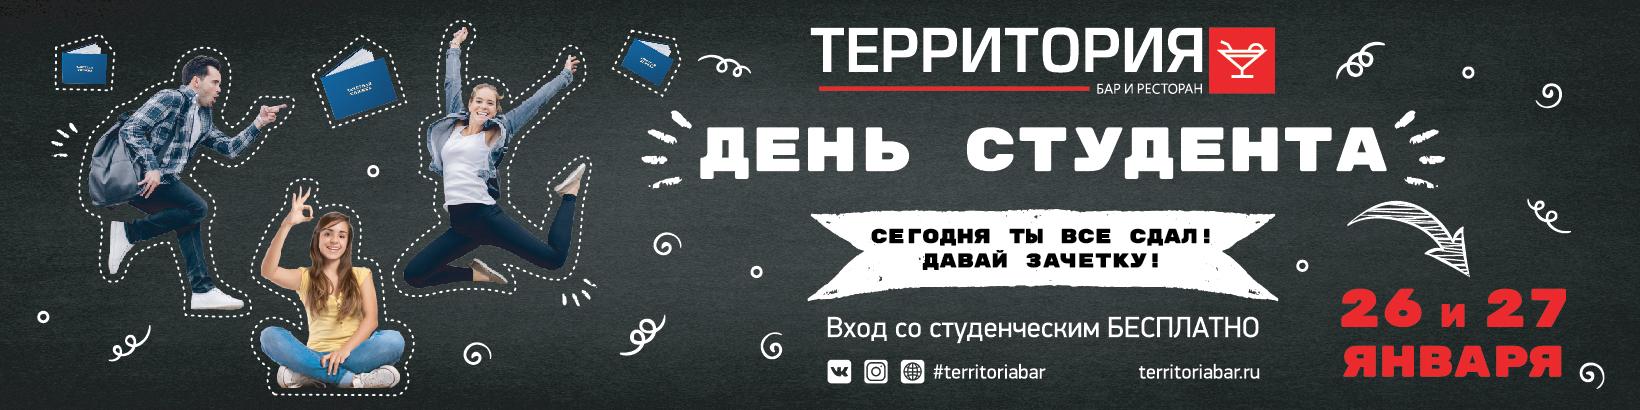 День студента Территория